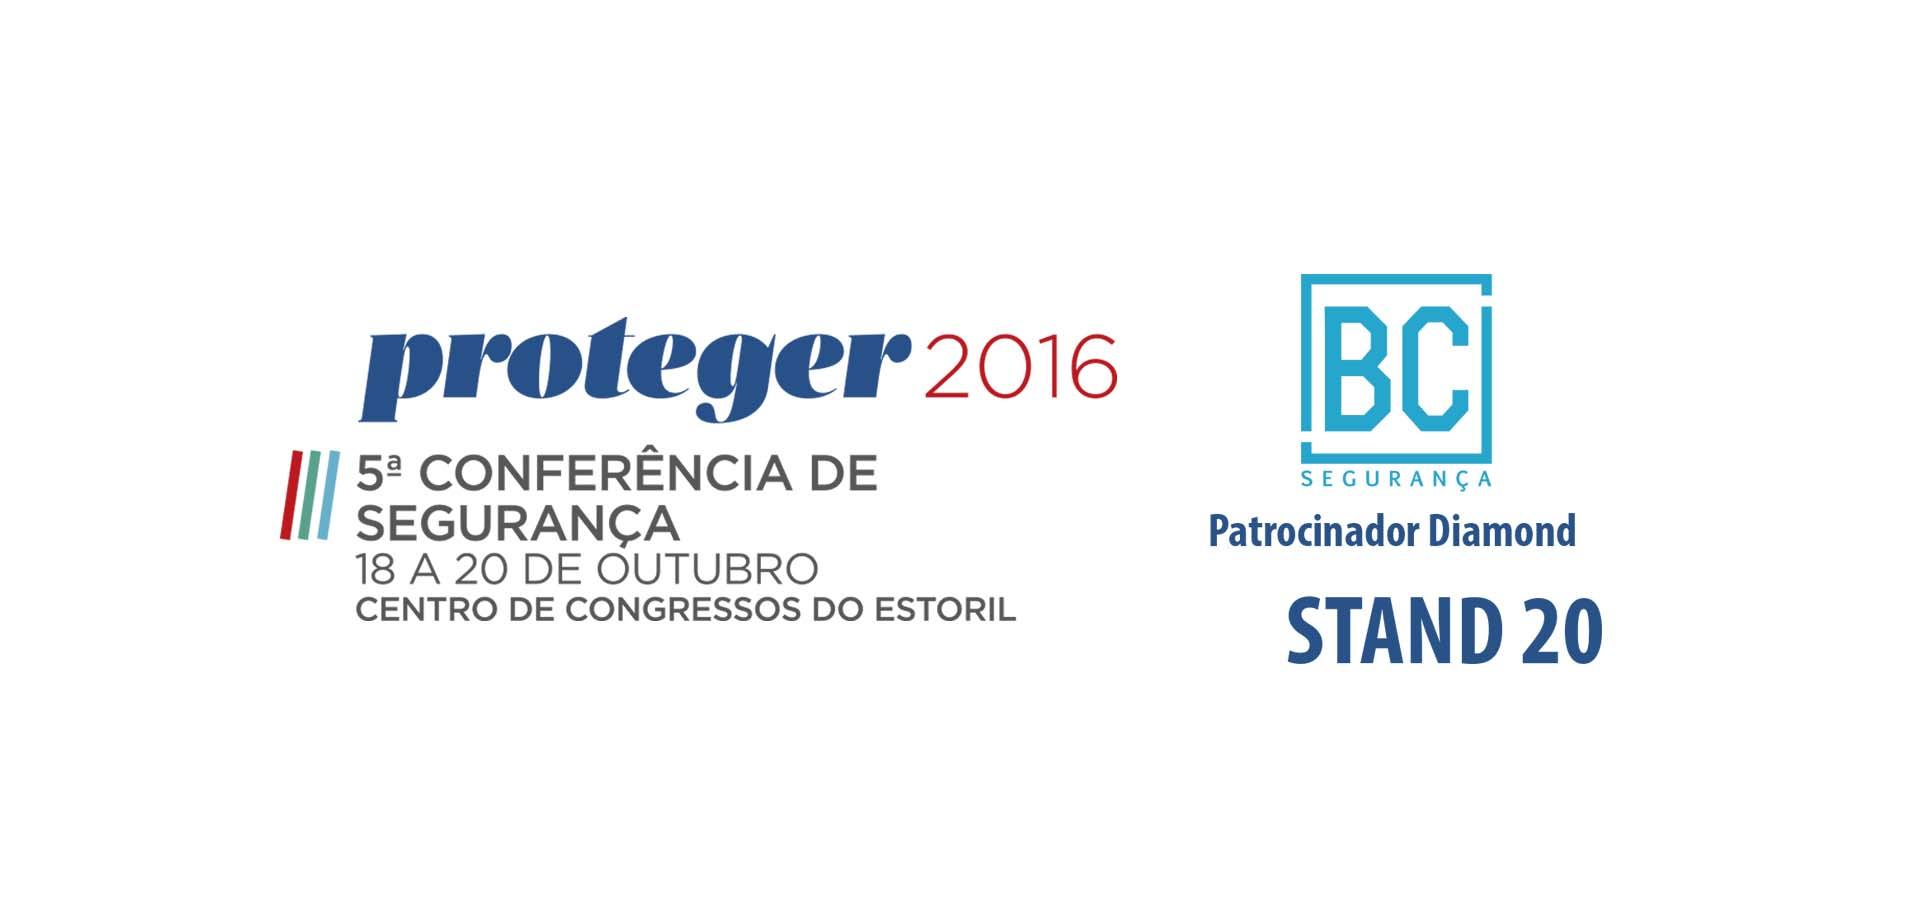 Proteger 2016 - 5ª Conferência de Segurança